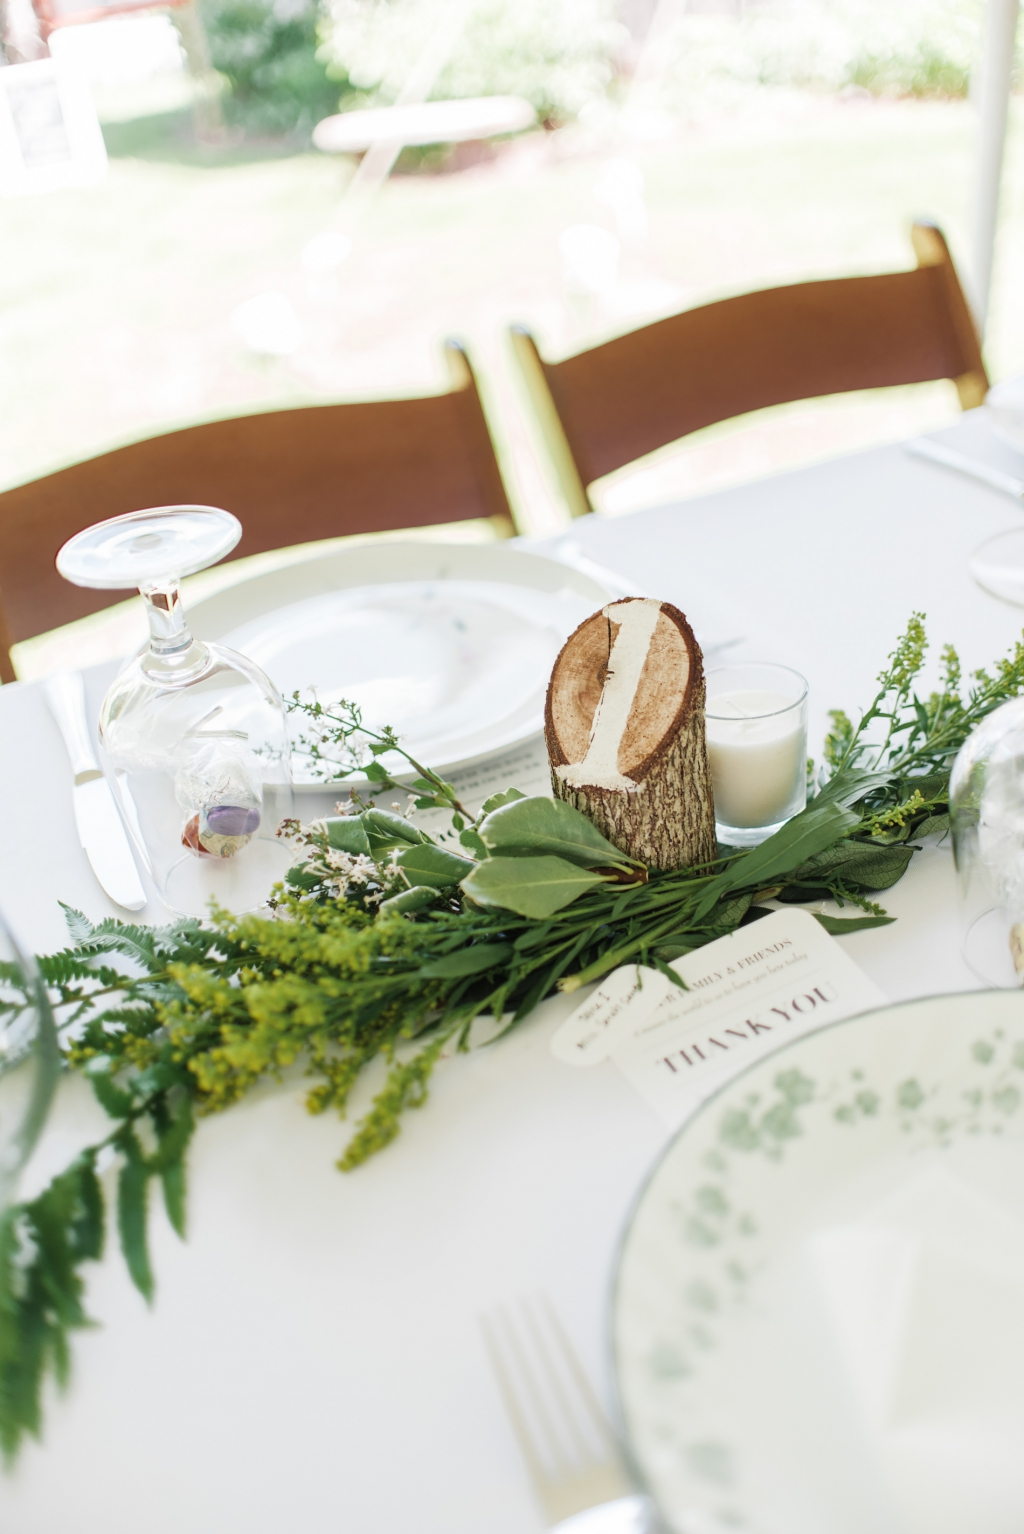 20170603_du_soleil_photographie_wedding_dana&steven_details-68